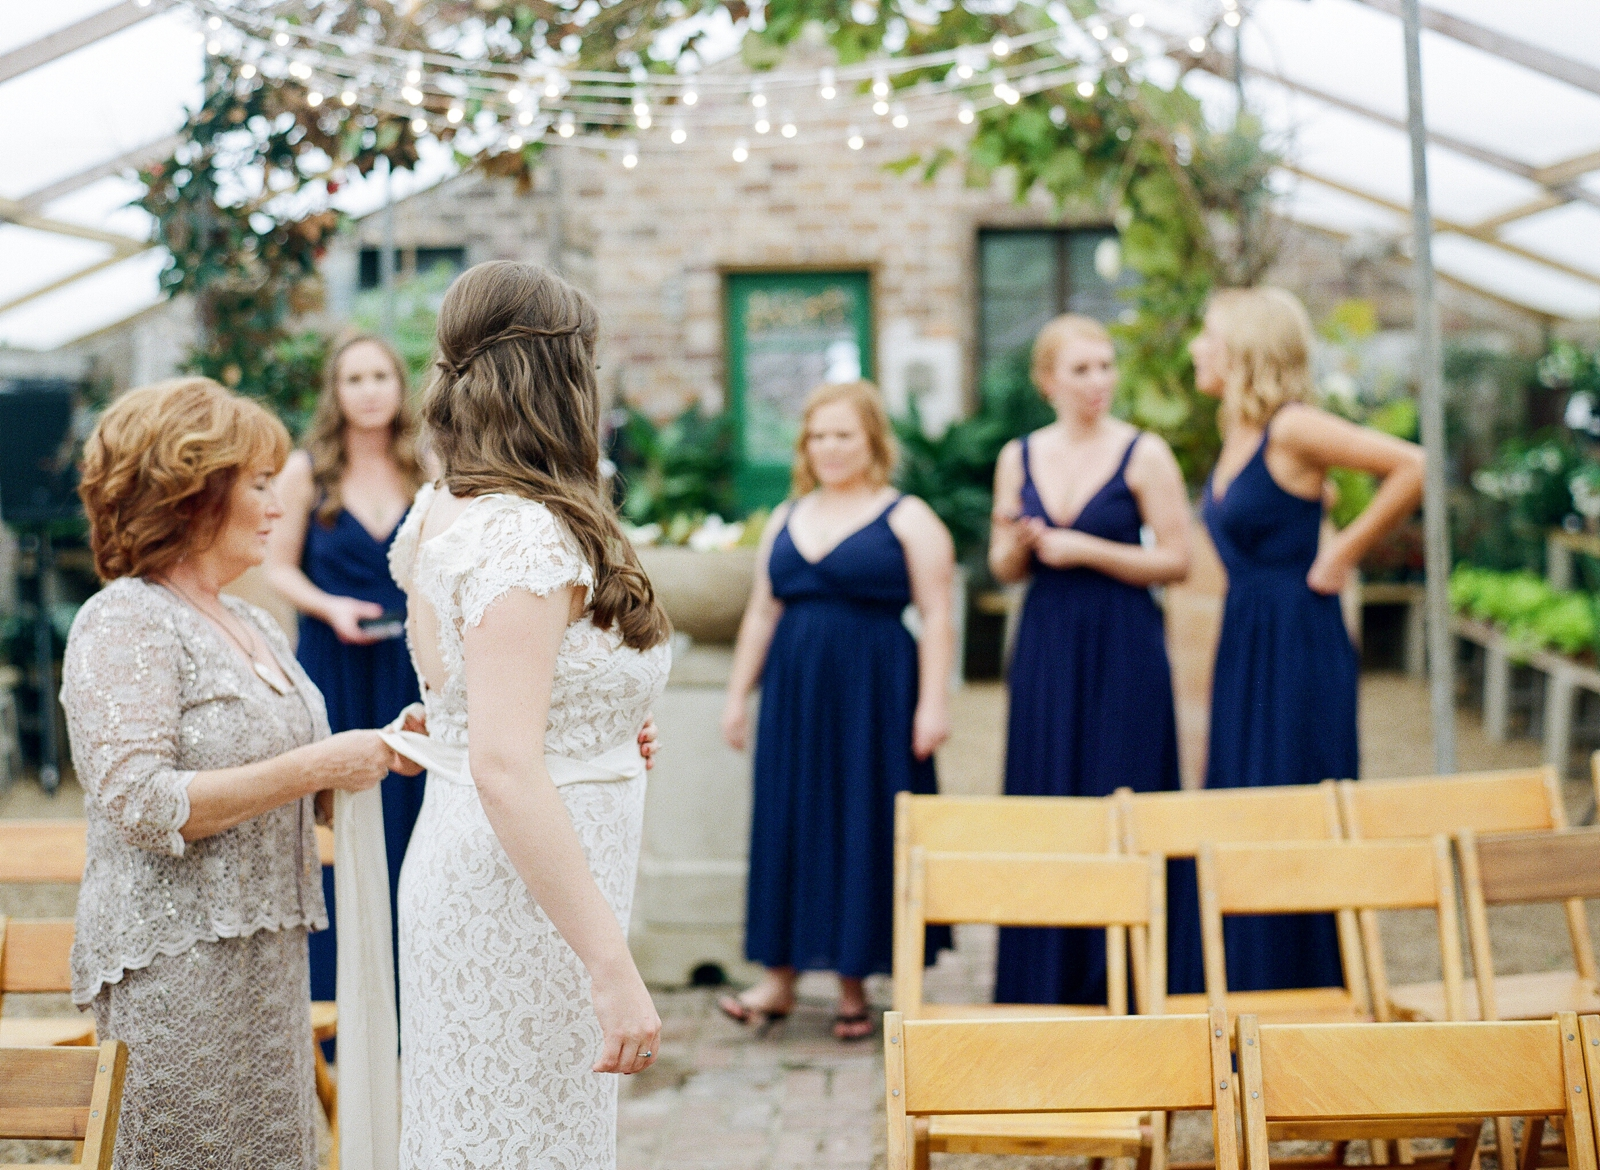 tallahassee greenhouse wedding purple martin outpost tallahassee florida shannon griffin_0006.jpg